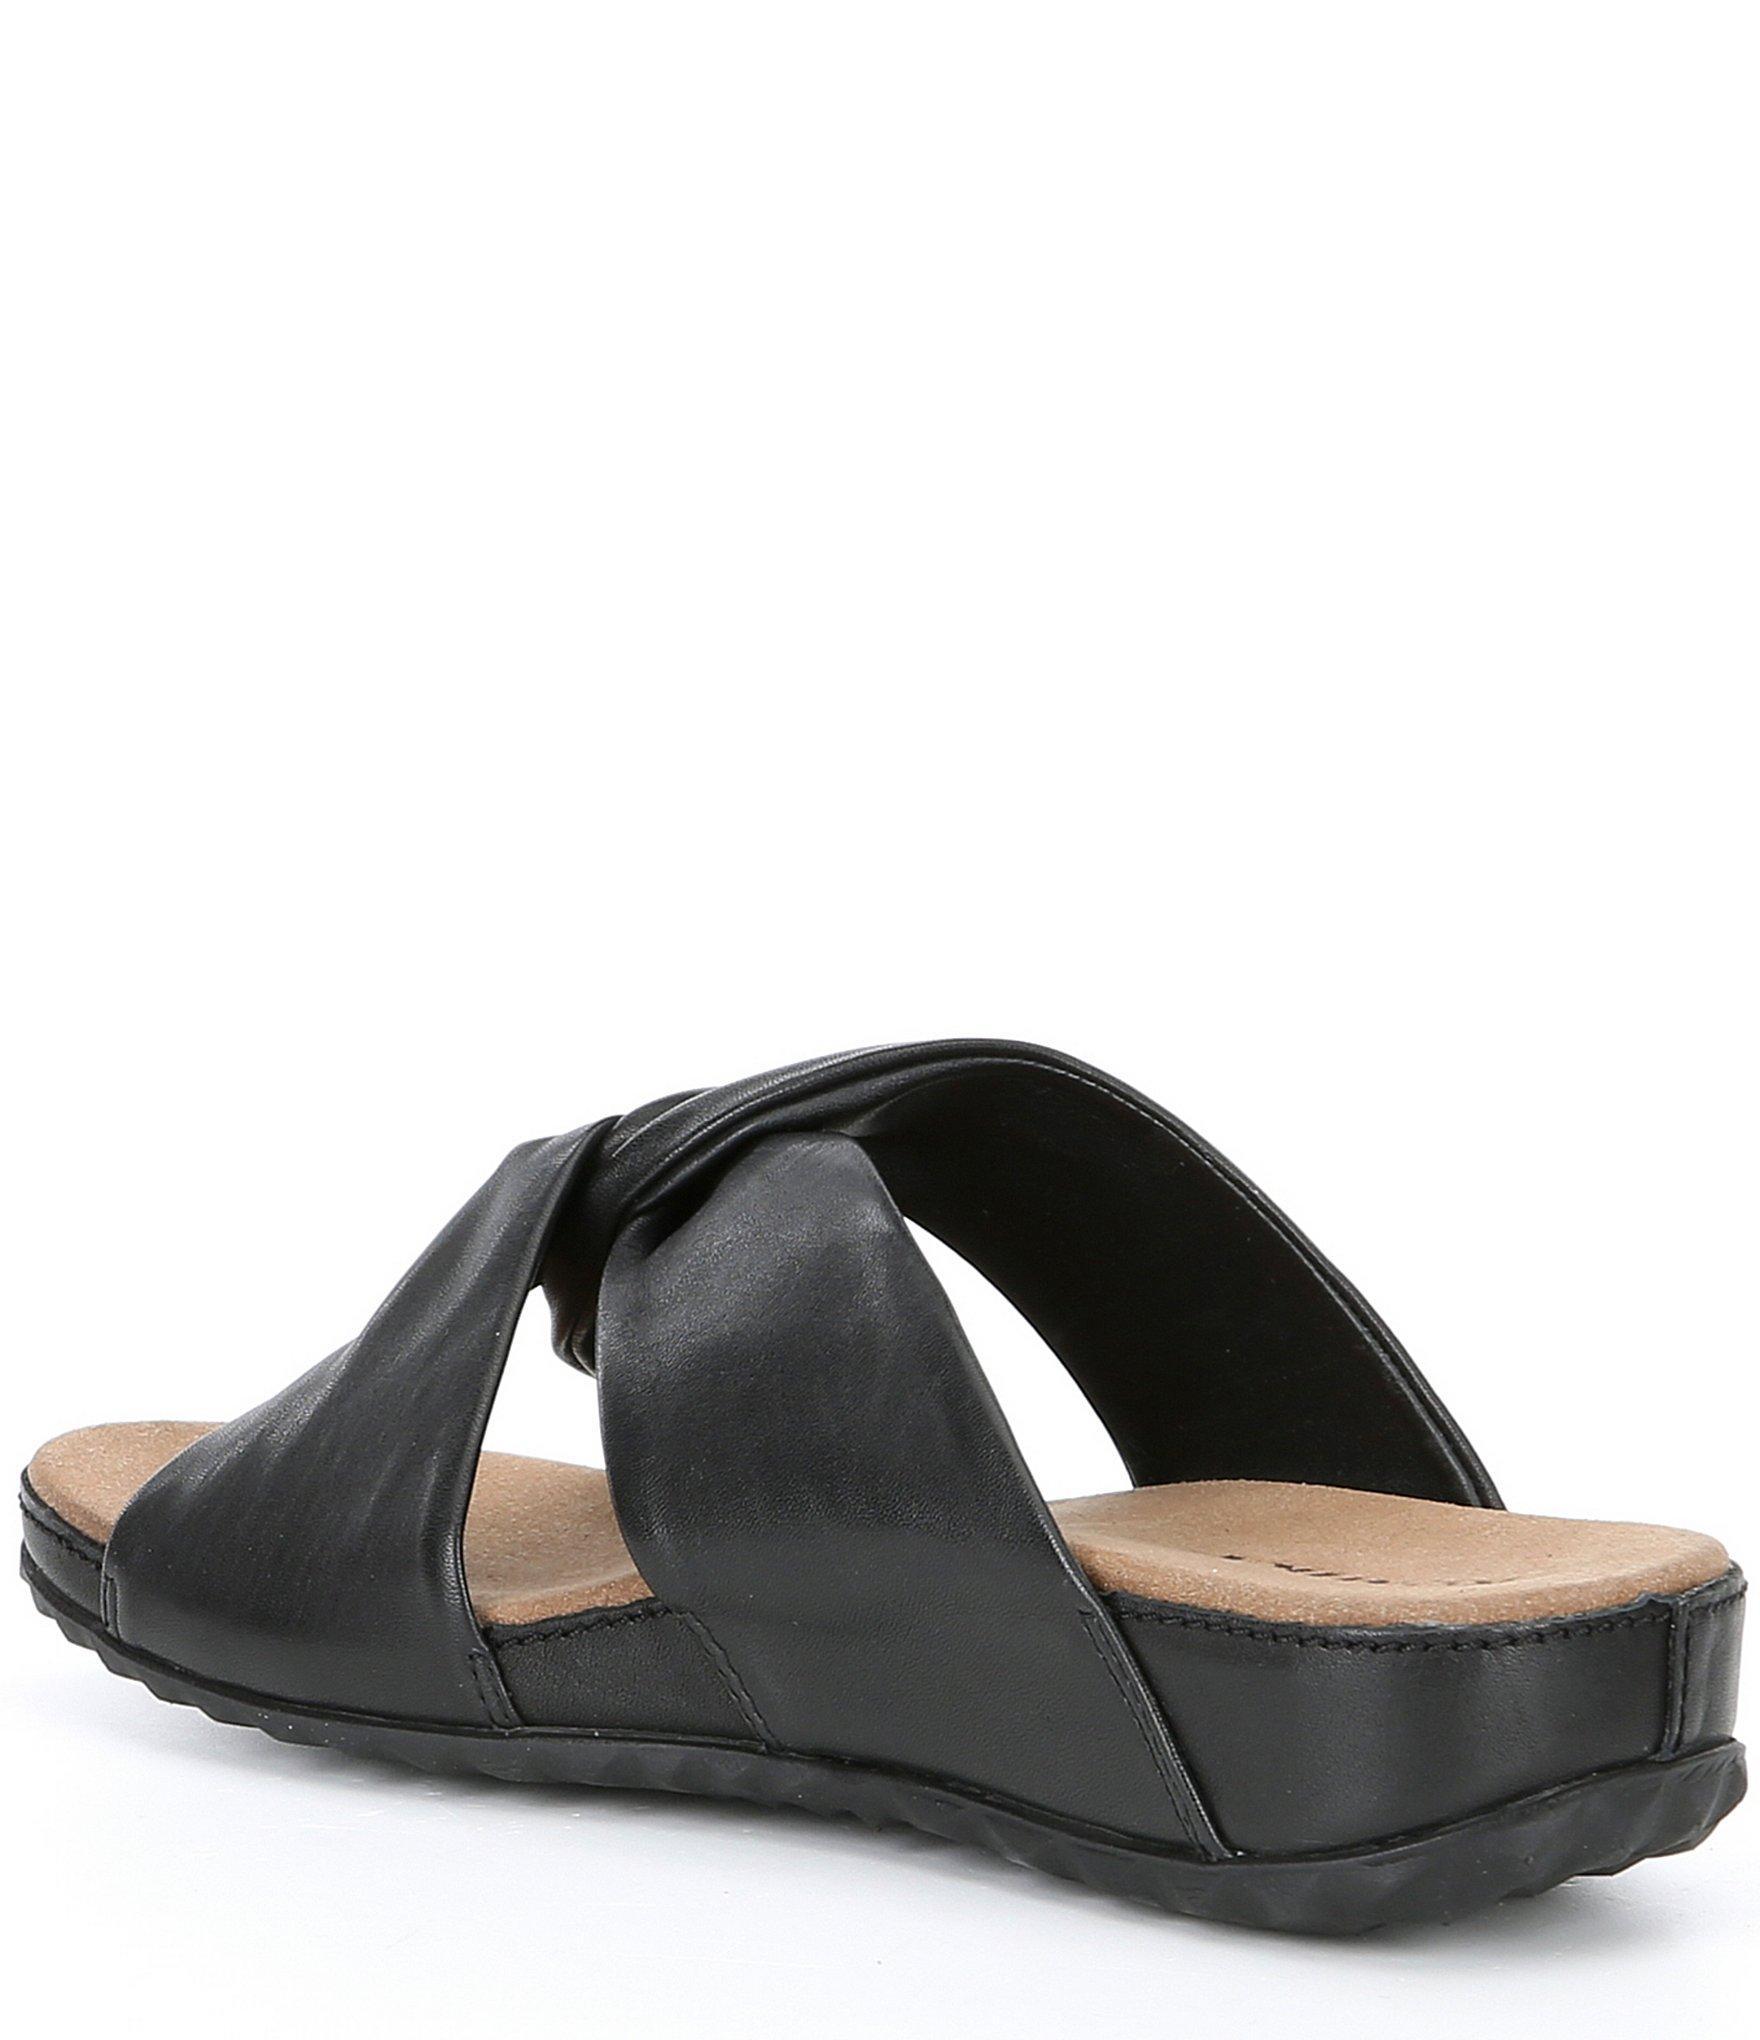 2d754d48c3c9 Romika - Black Florenz 10 Leather Wedge Slide - Lyst. View fullscreen